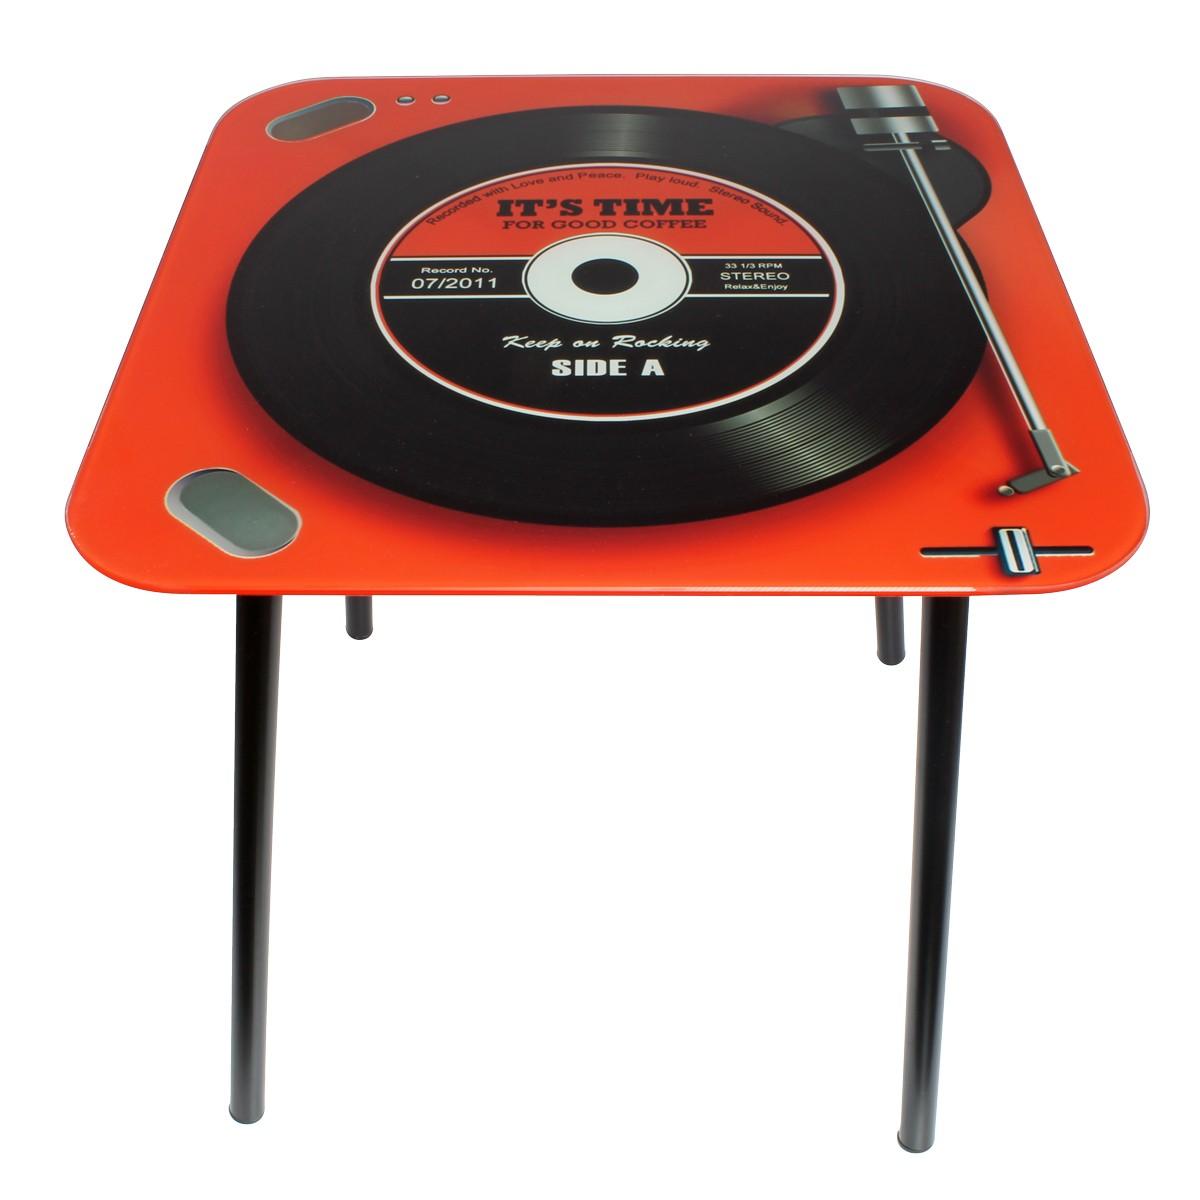 Mesa de Canto Quadrada Vintage Keep on Rocking Red 40x40x40cm